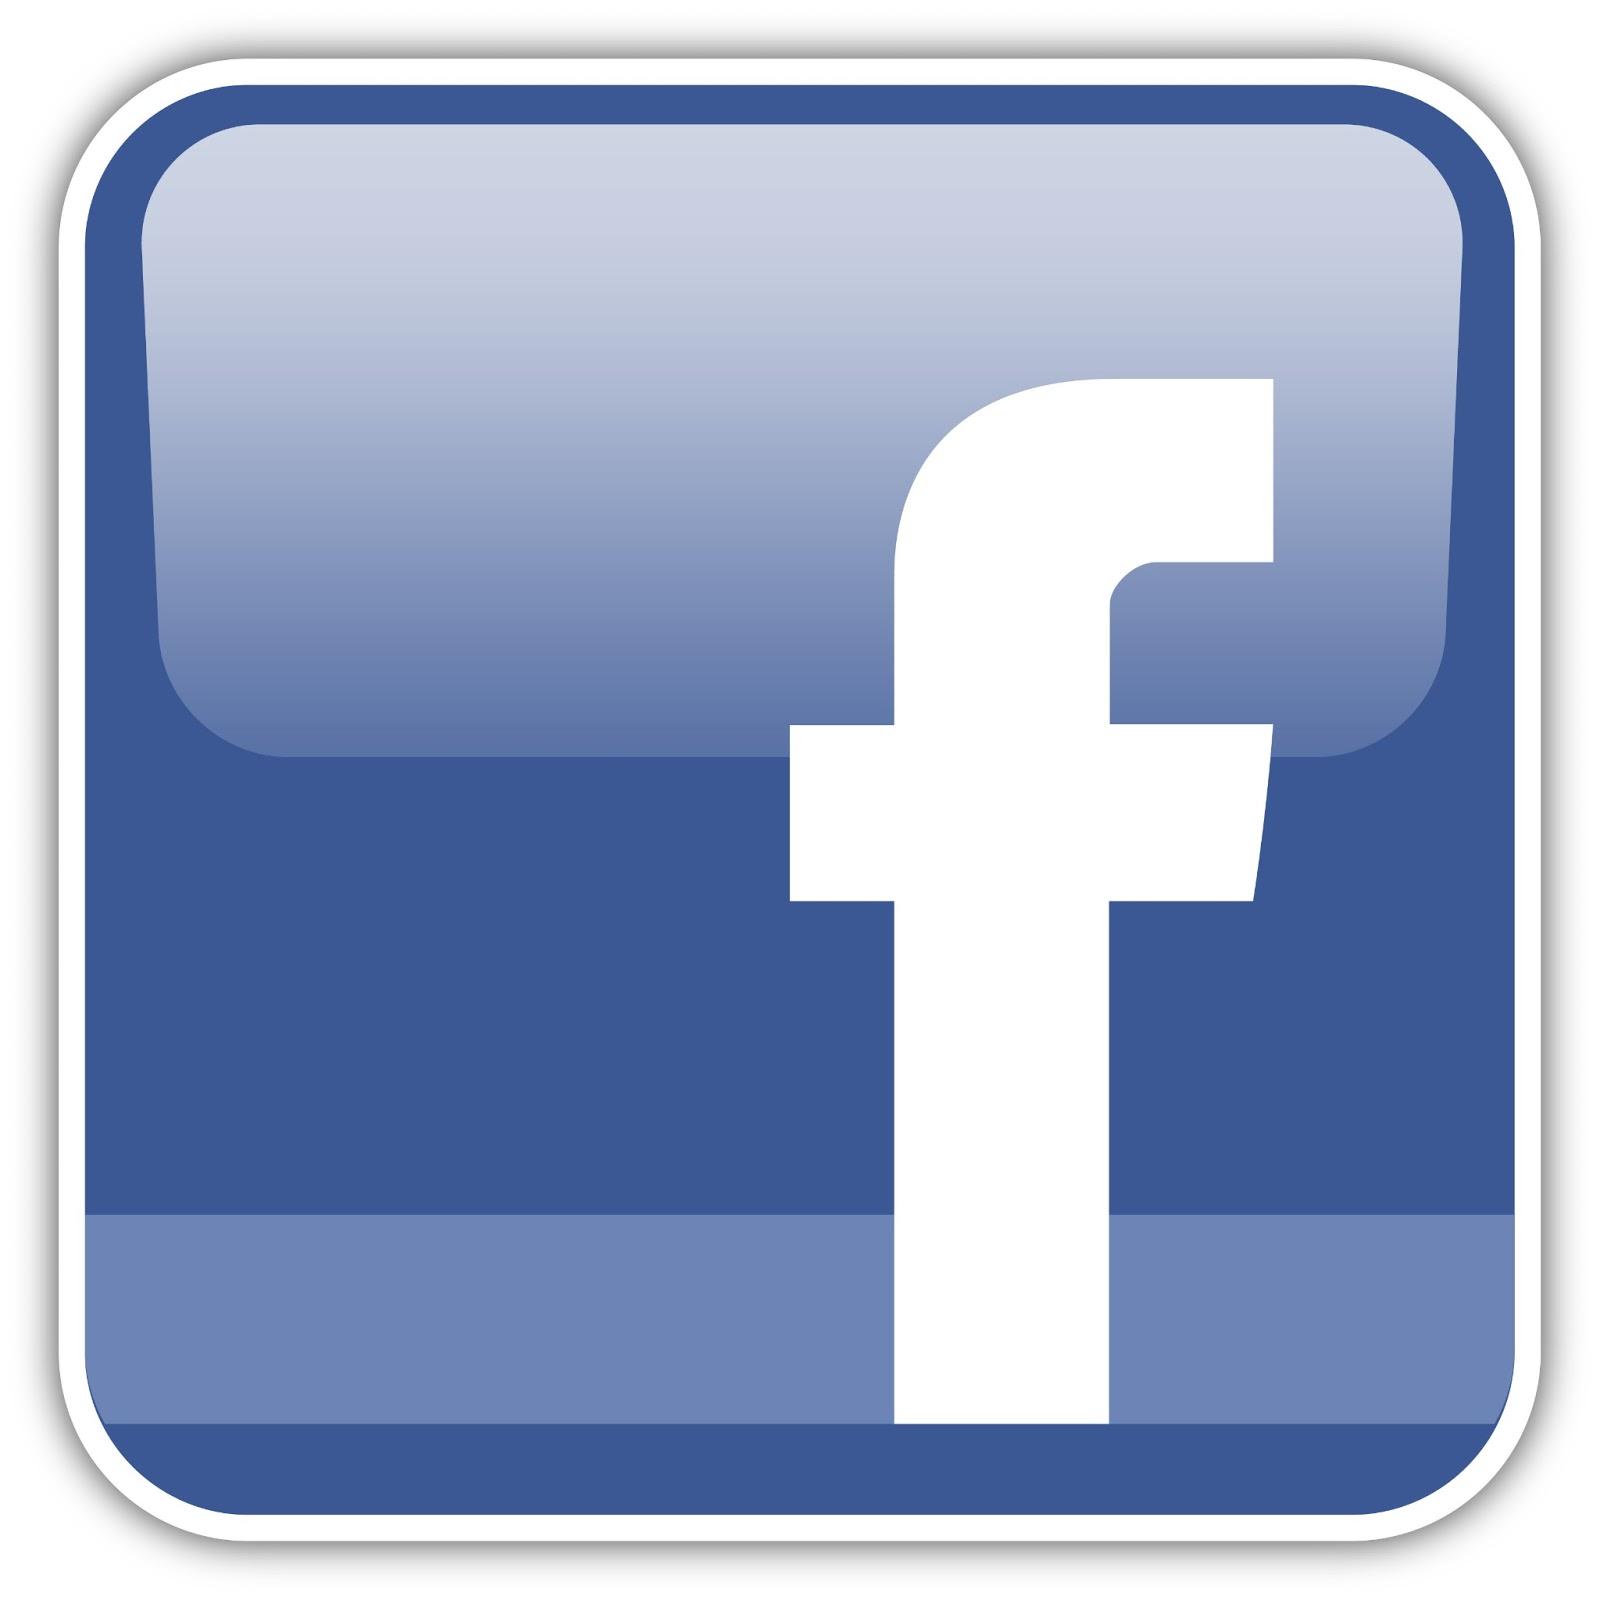 Hướng dẫn sửa ảnh profile trên Facebook